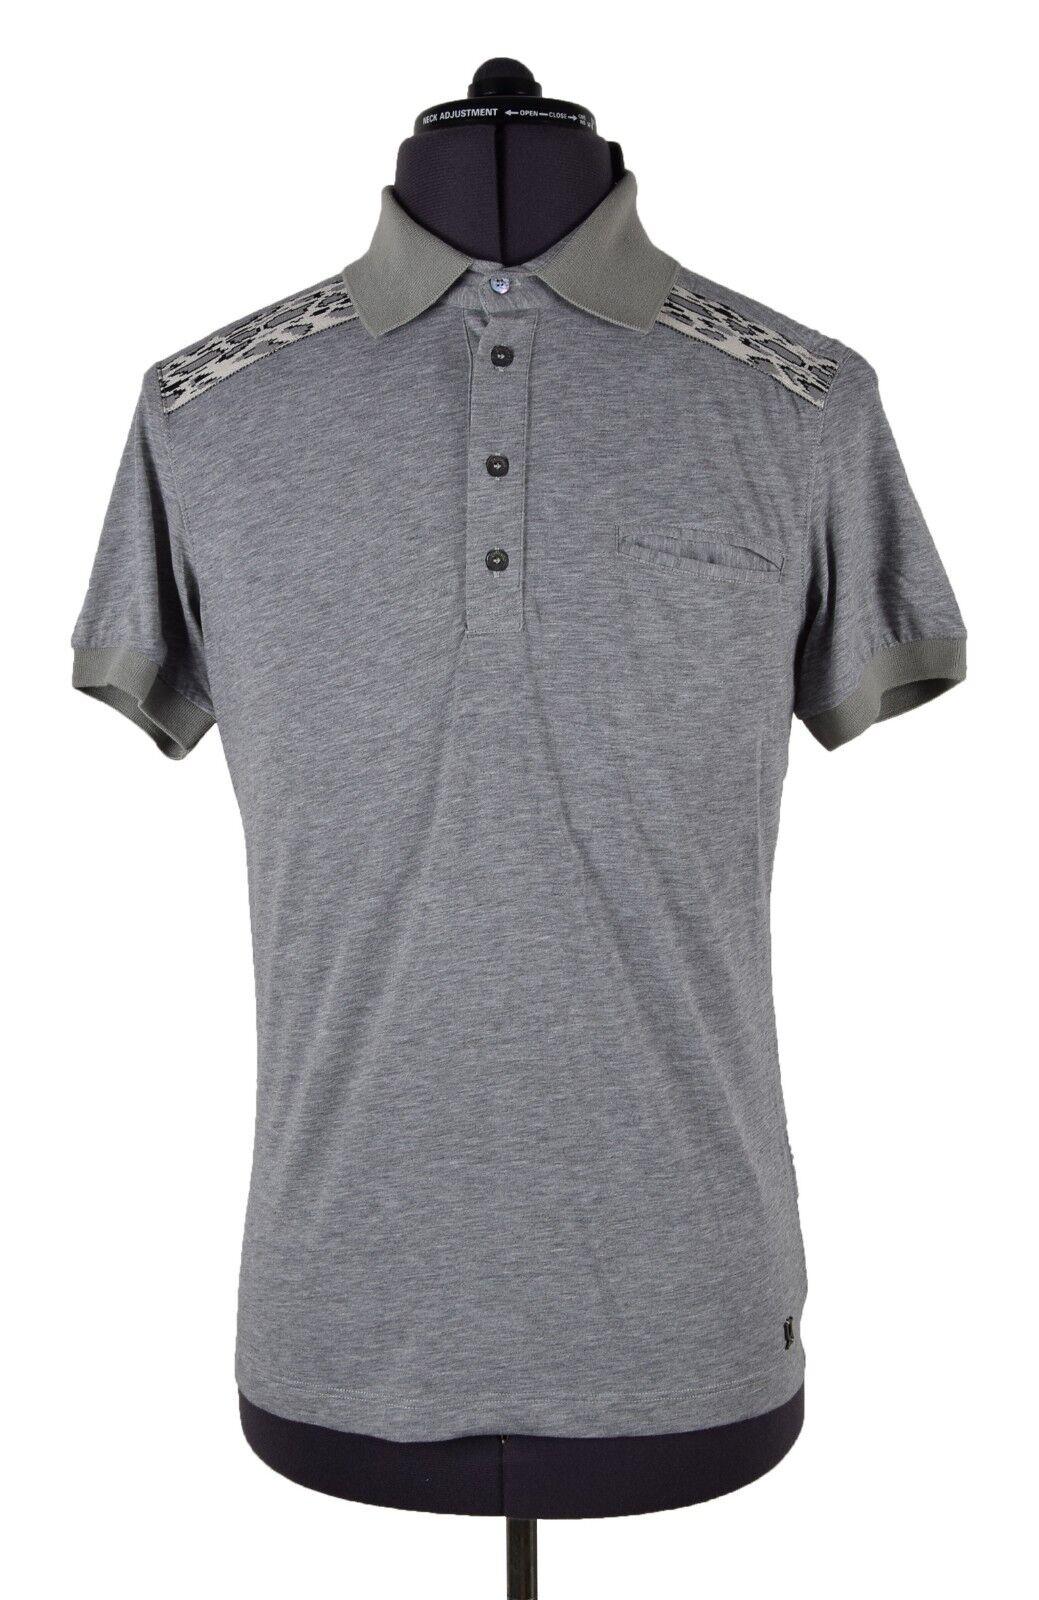 Galliano Men's Polo Shirt John Galliano M